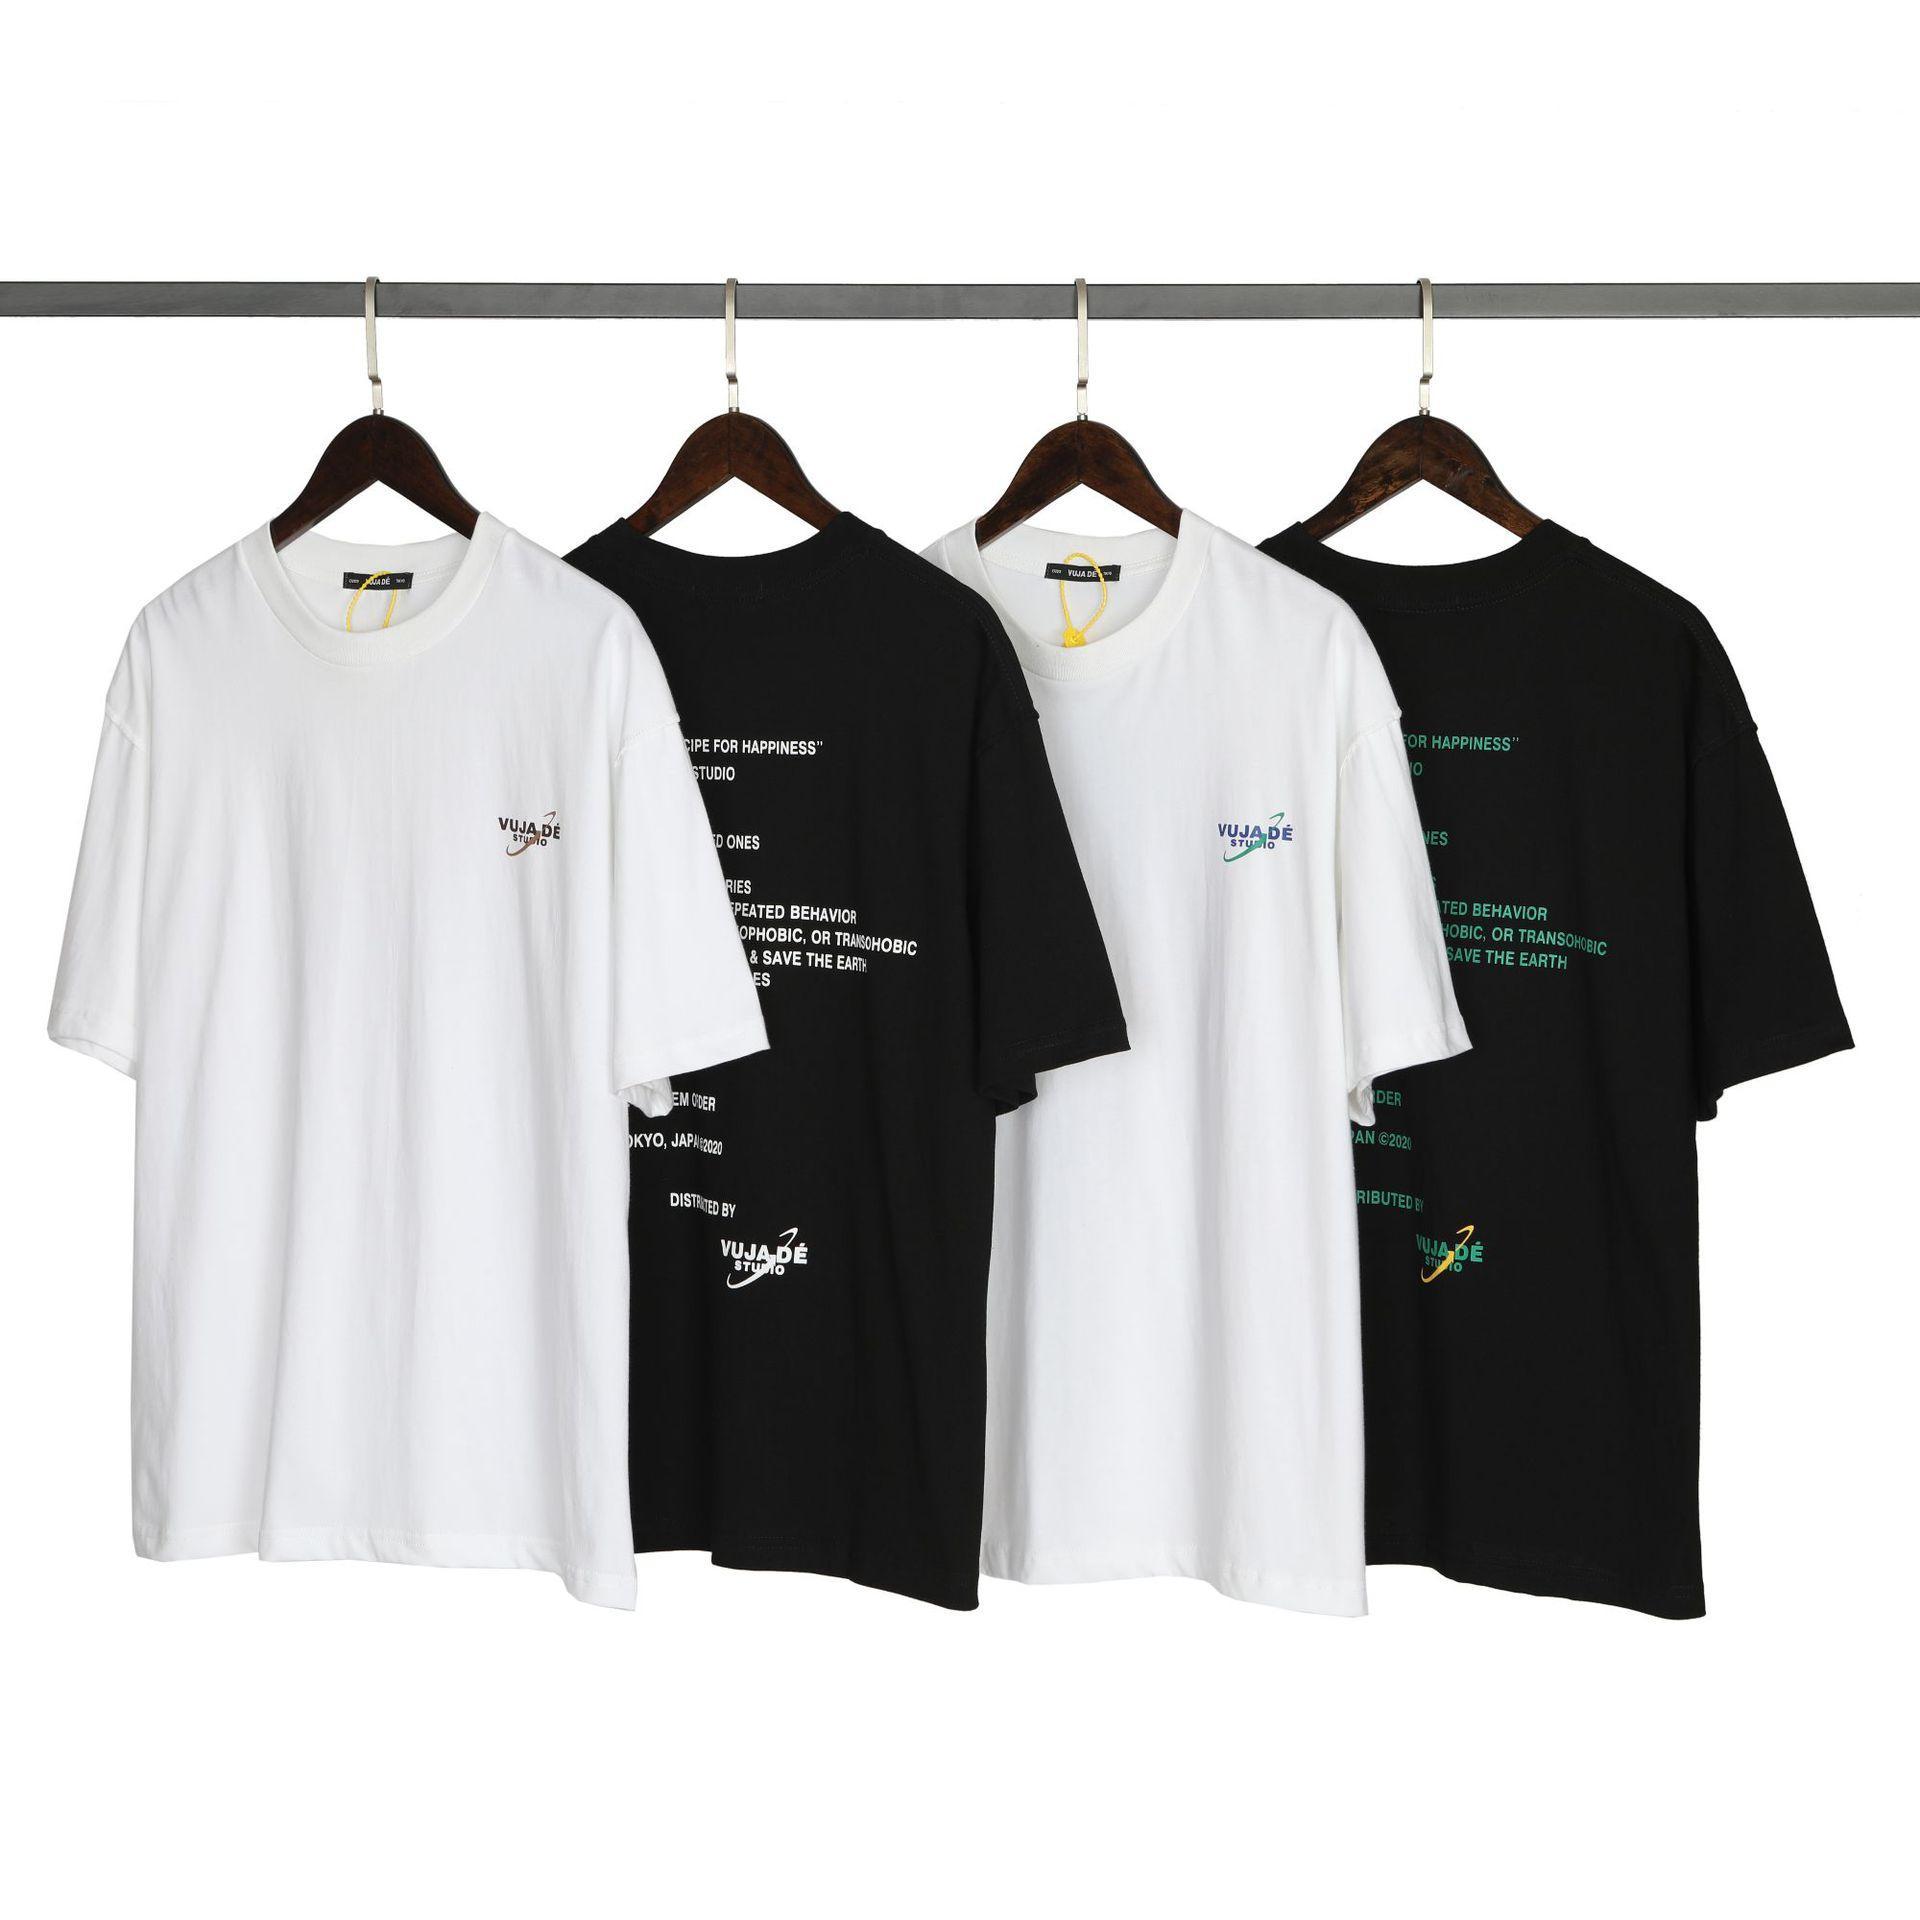 VUJADE Vintage T Shirts Hombres Mujeres Slogan Tee New Designer T Shirt 2021 Hip Hop Oversized Top Ropa